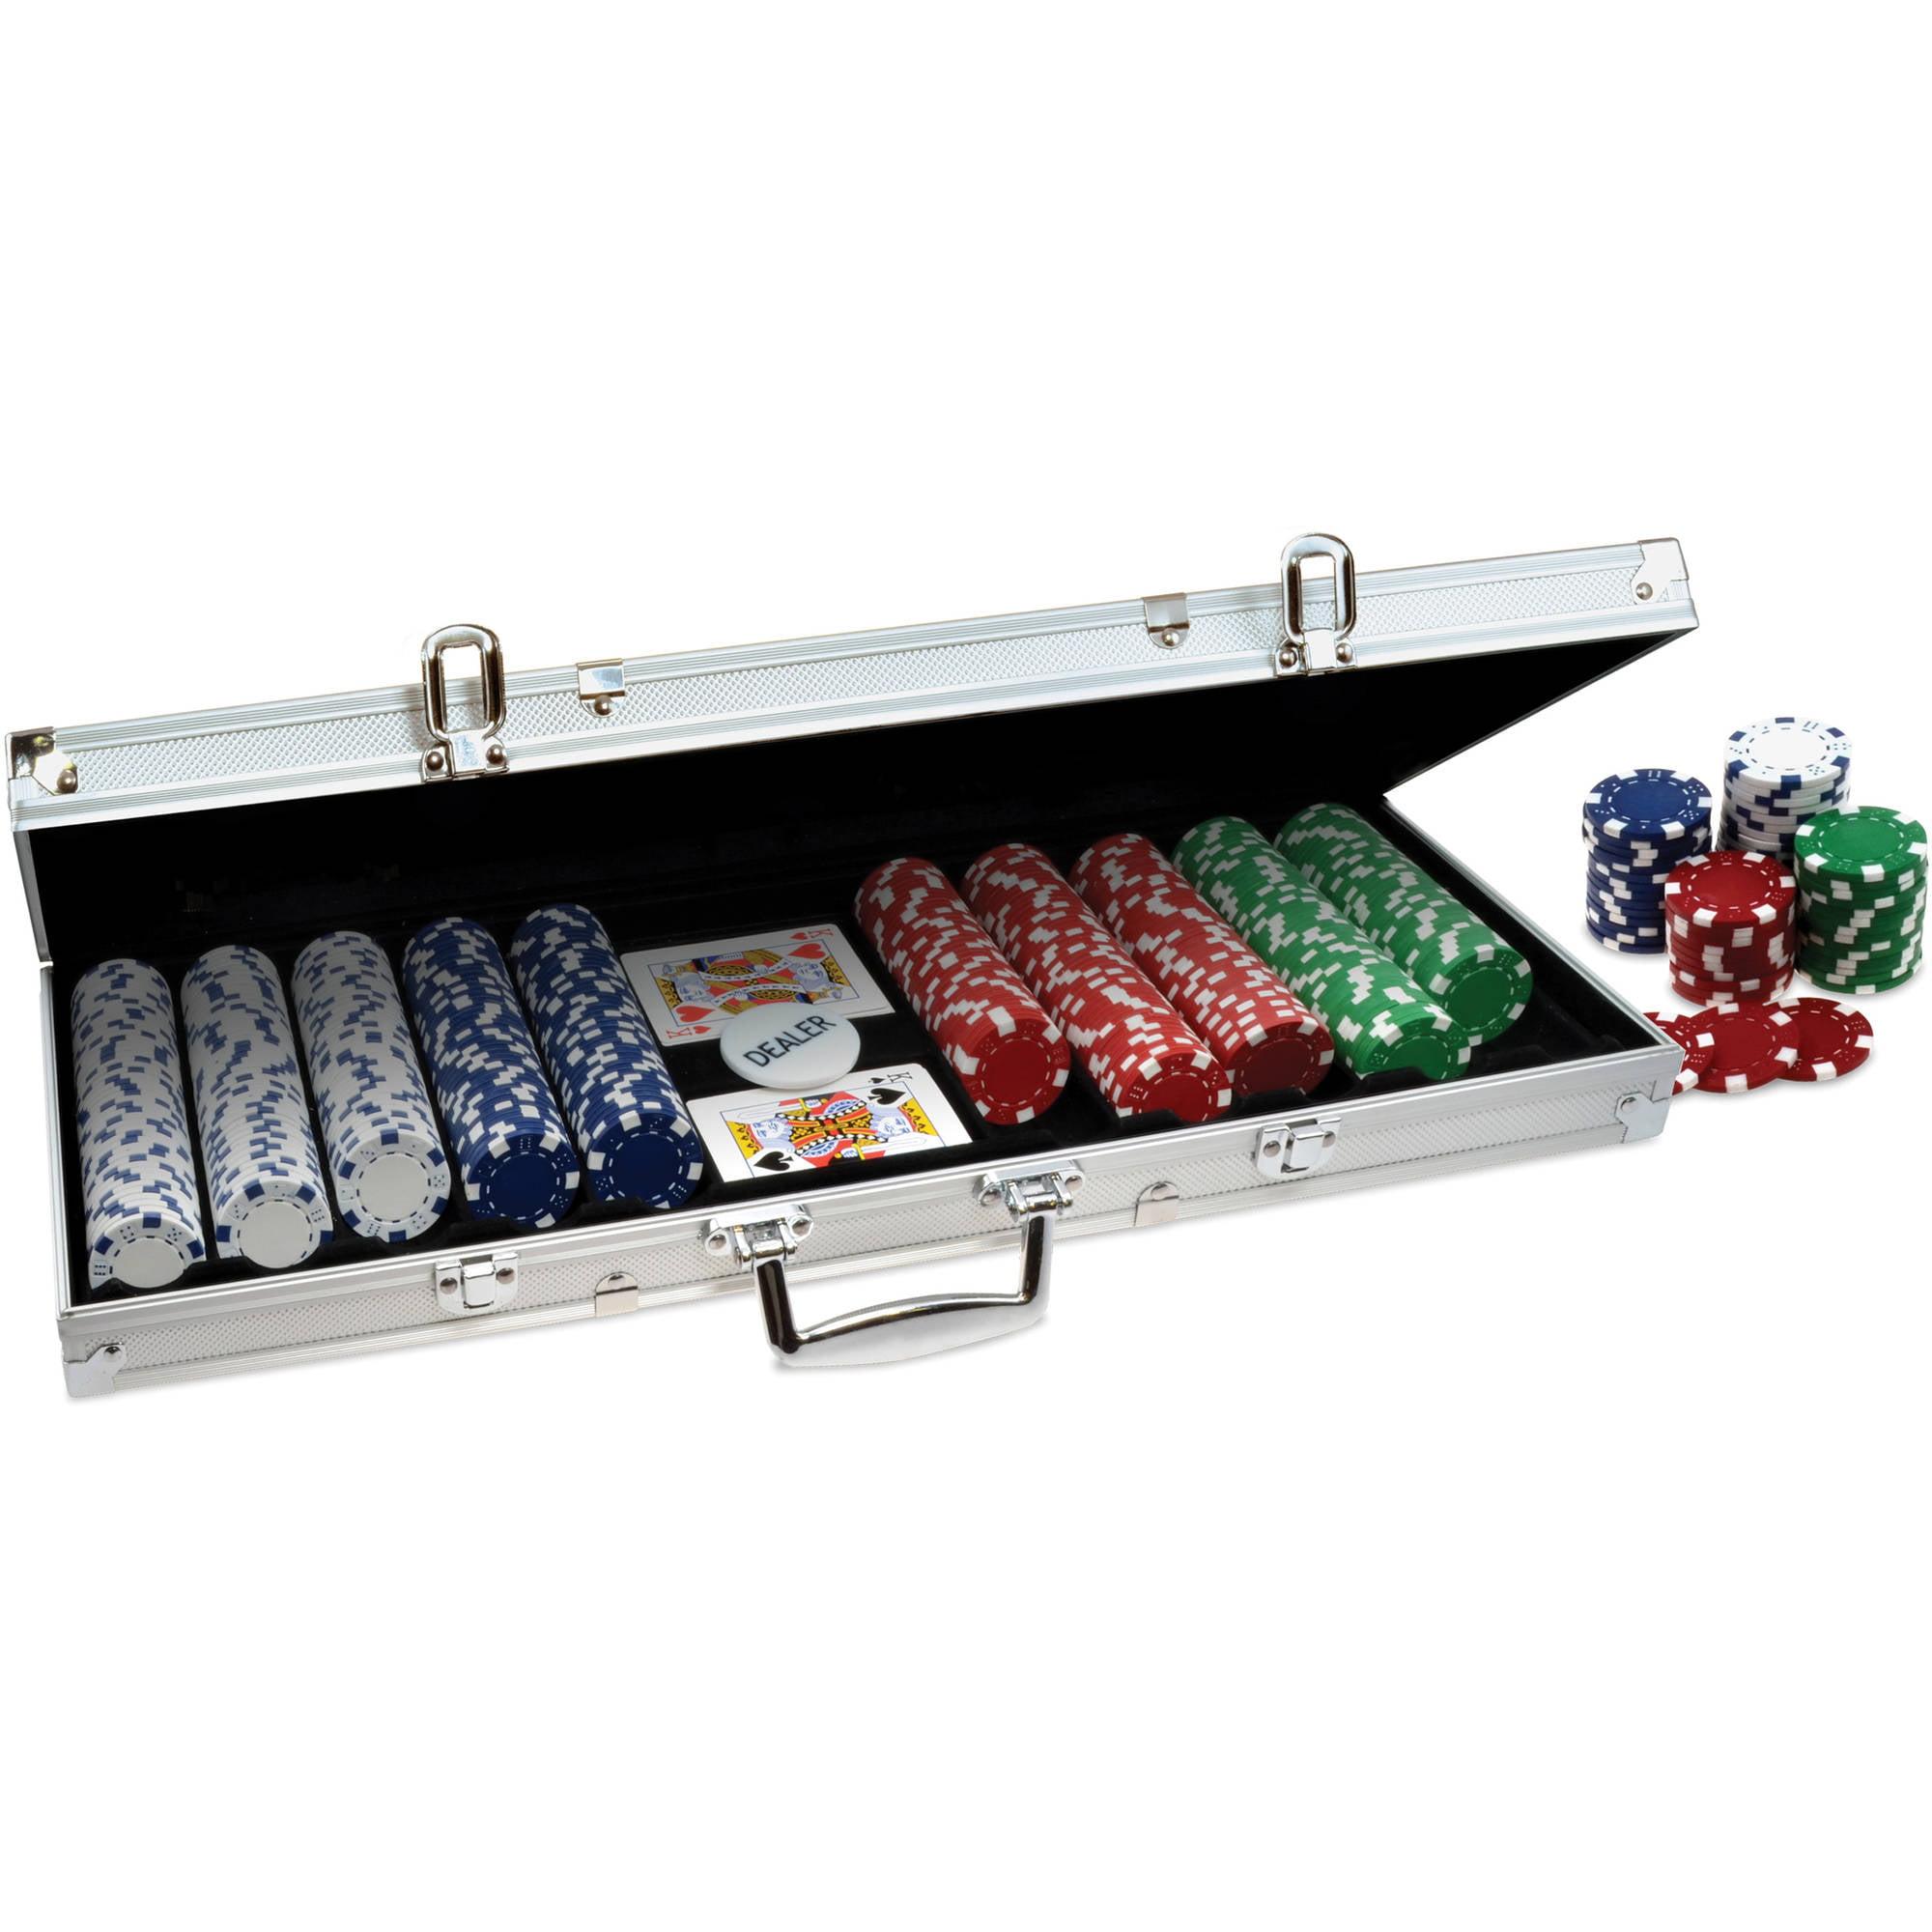 Chip Case  500 Sturdy Vinyl Case Holds 500 Poker Chips NEW Item FREE SHIPPING